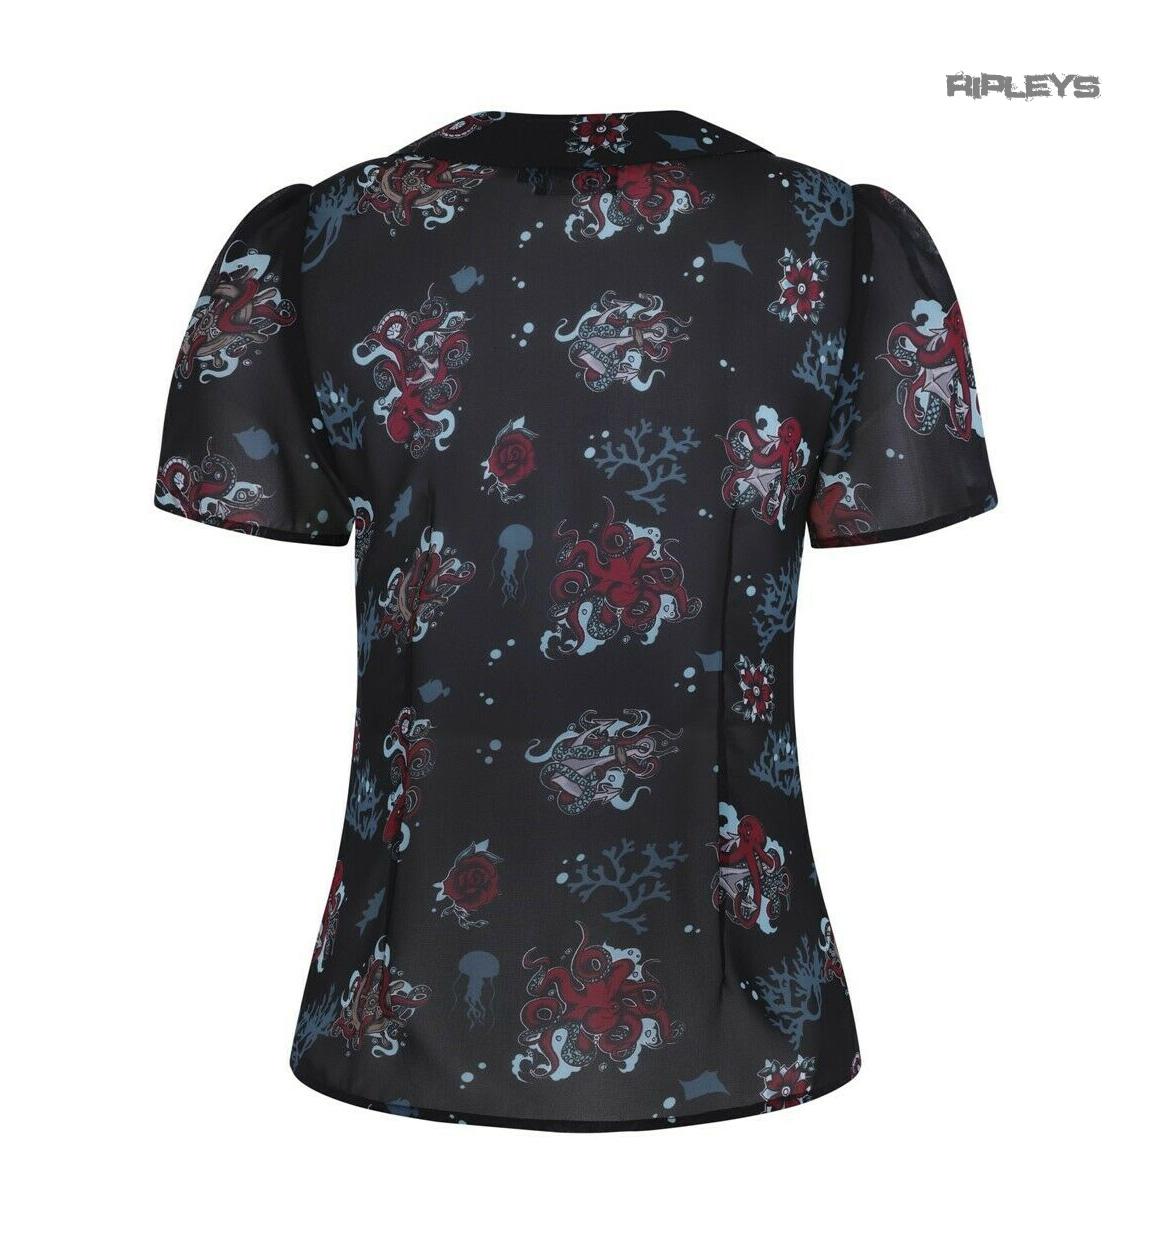 Hell-Bunny-50s-Shirt-Top-Black-Ocean-Octopus-Roses-POSEIDON-Blouse-All-Sizes thumbnail 18